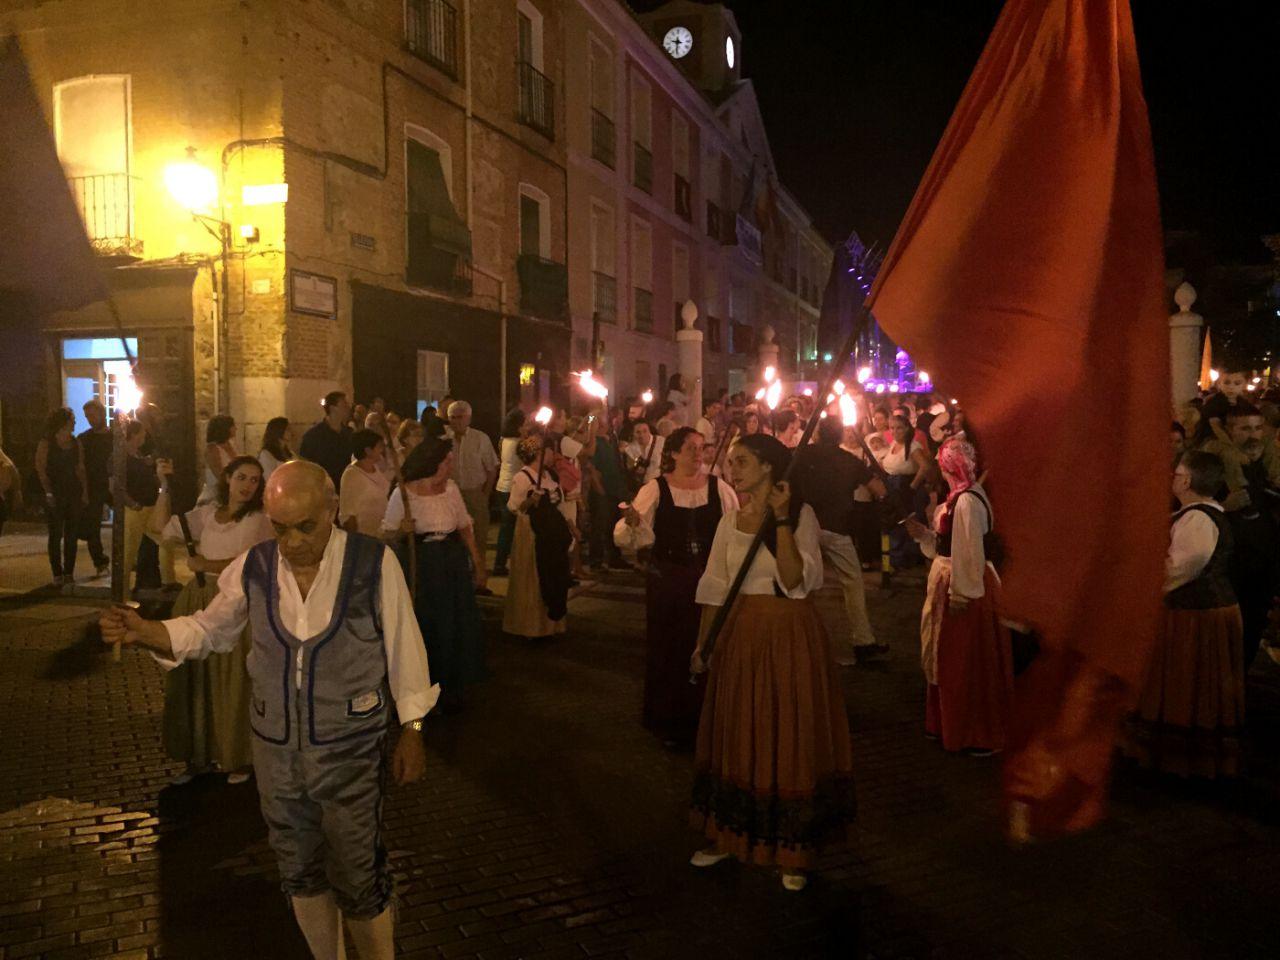 El motín de Aranjuez